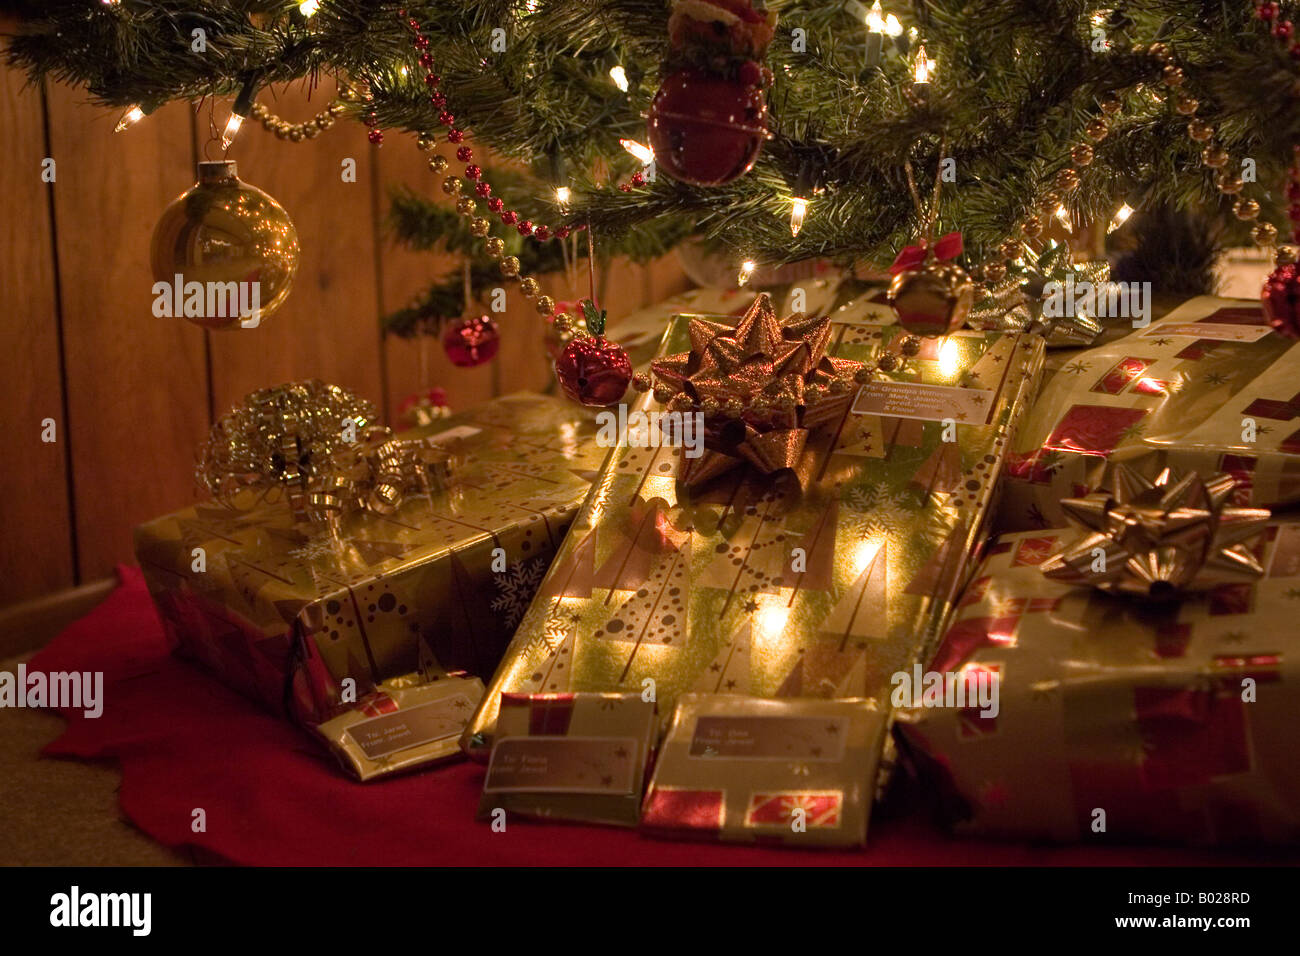 Wrapped Christmas Presents Under Christmas Tree Christmas